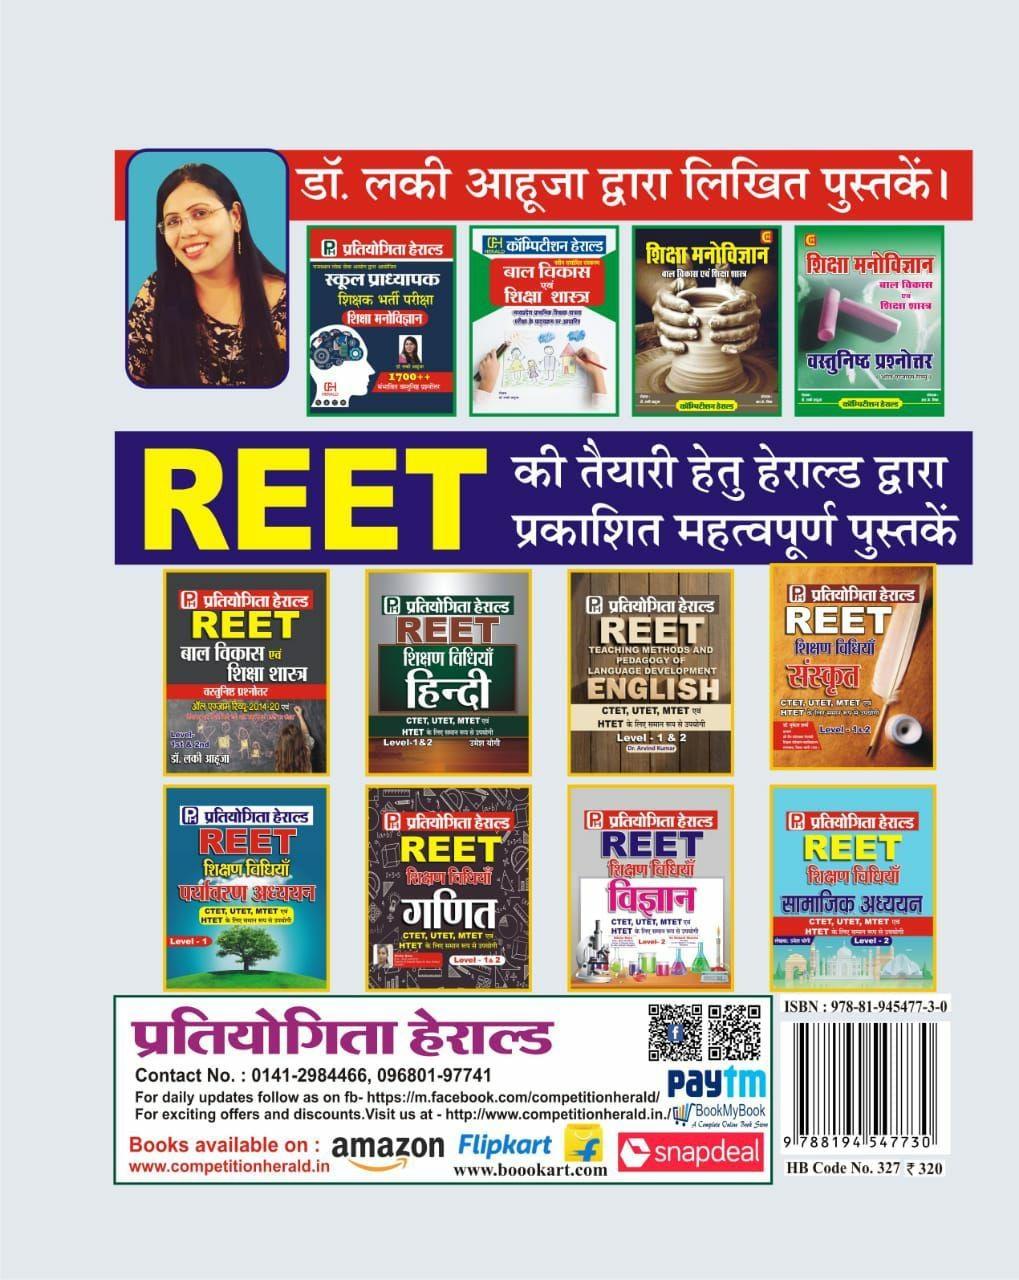 REET/RTET Shiksha Manovigyan Bal Vikas Avam Shiksha Shastra {for Level 1 (class 1 To Class 5) & Level 2 (class 6 To Class 8)} Based On Latest REET Syl